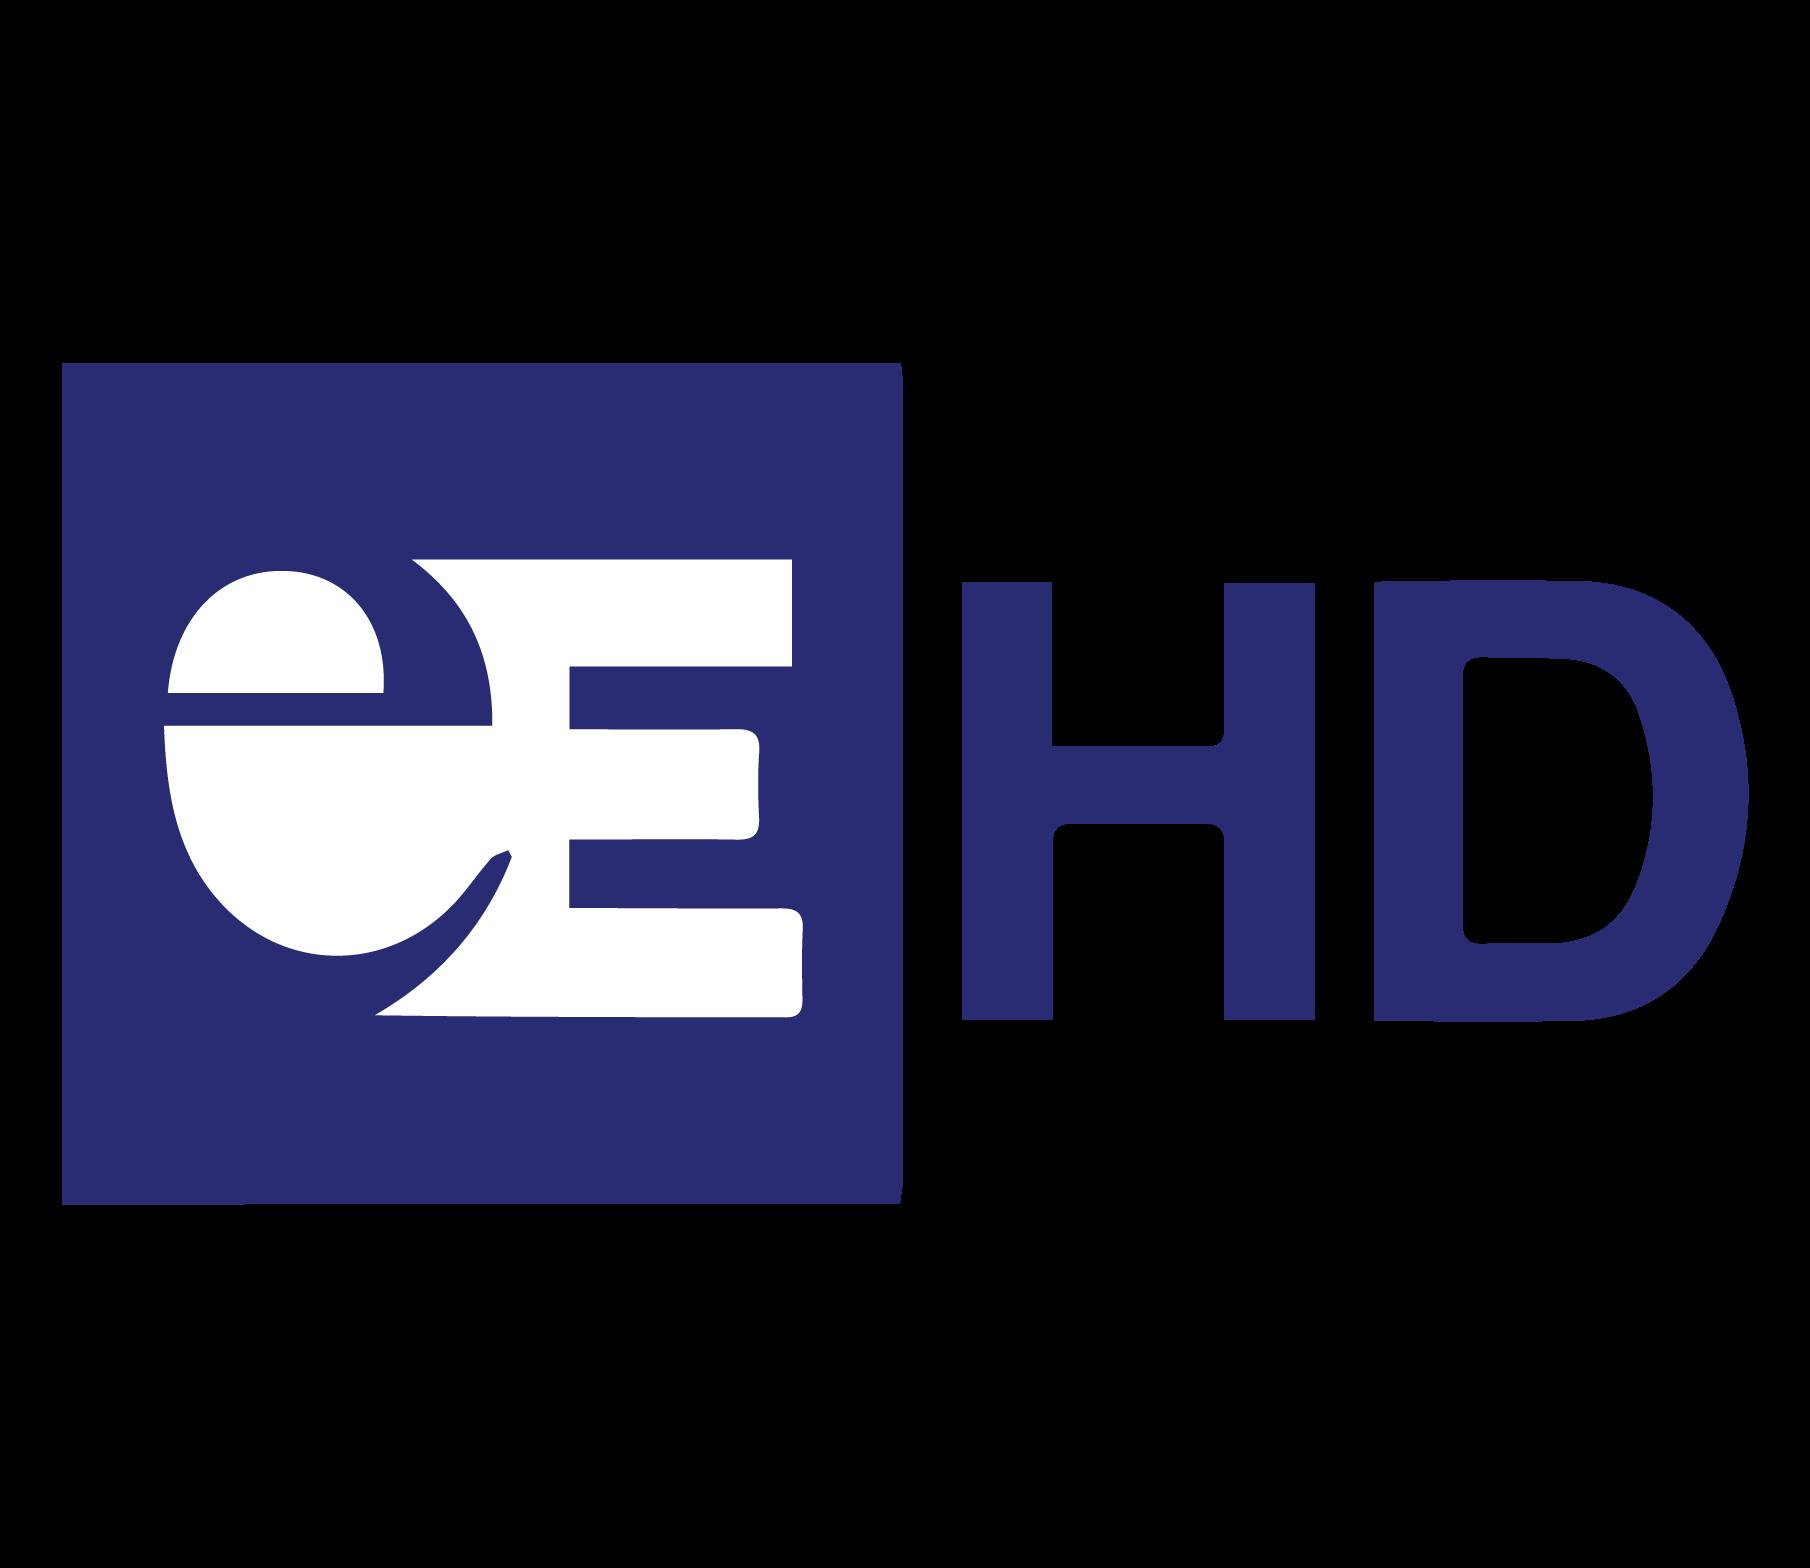 Canal Europa HD